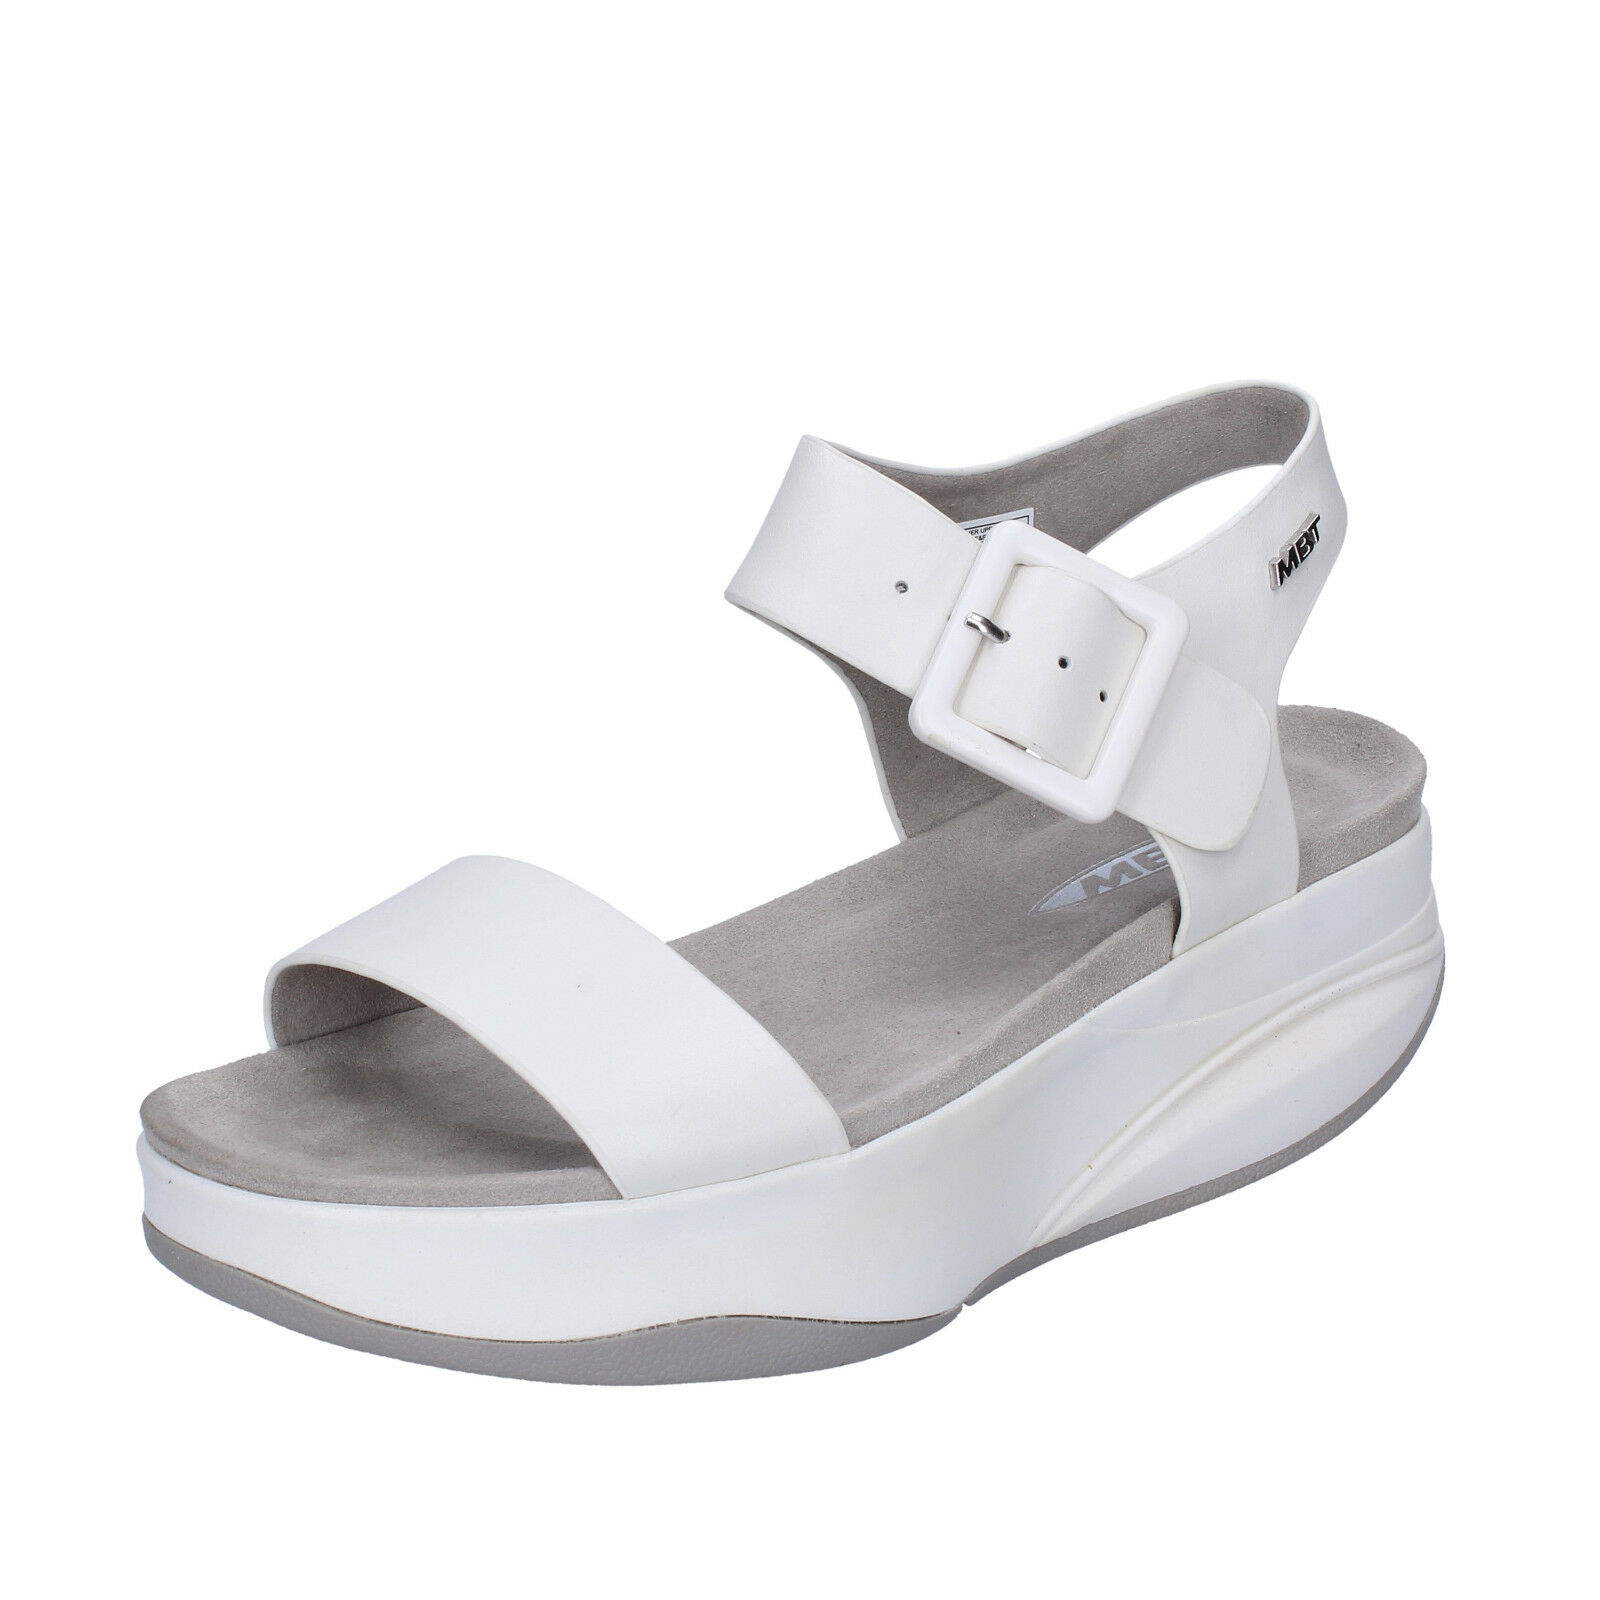 scarpe donna sandali MBT MANNI 42 EU sandali donna bianco pelle performance BX884-42 724f35